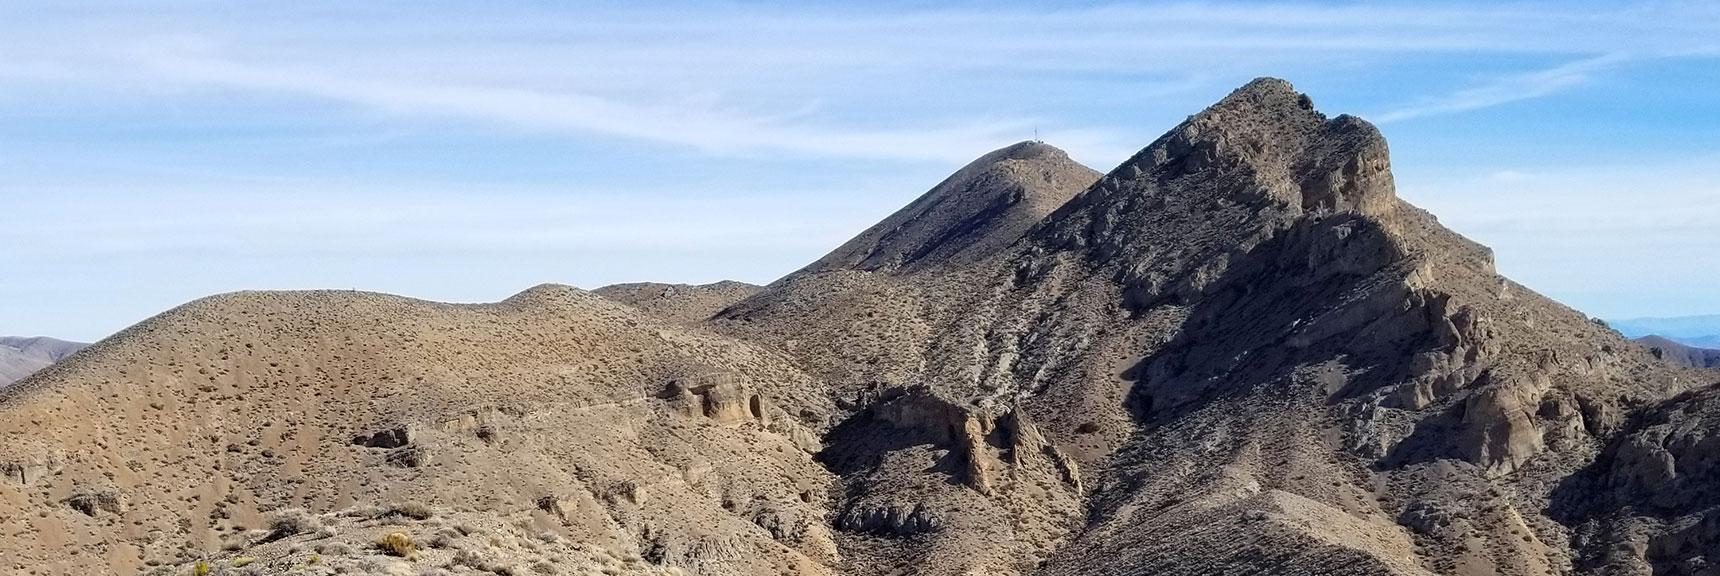 East Summit Viewed from West Summit of Gass Peak, Nevada